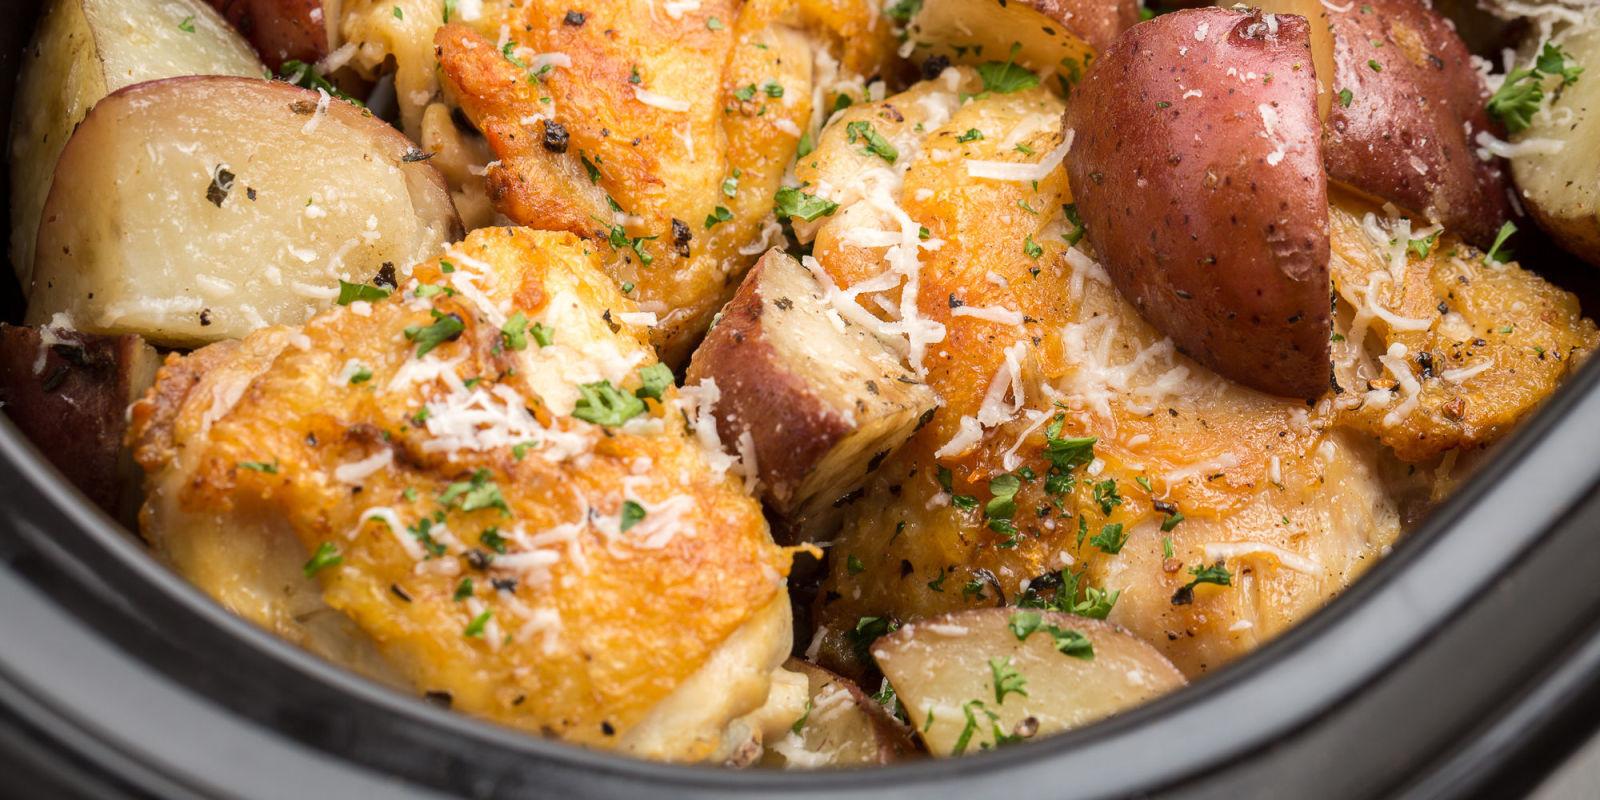 Slow Cooker Chicken Recipes Healthy  Popular Slow Cooker Chicken Pinterest Slow Cooker Chicken